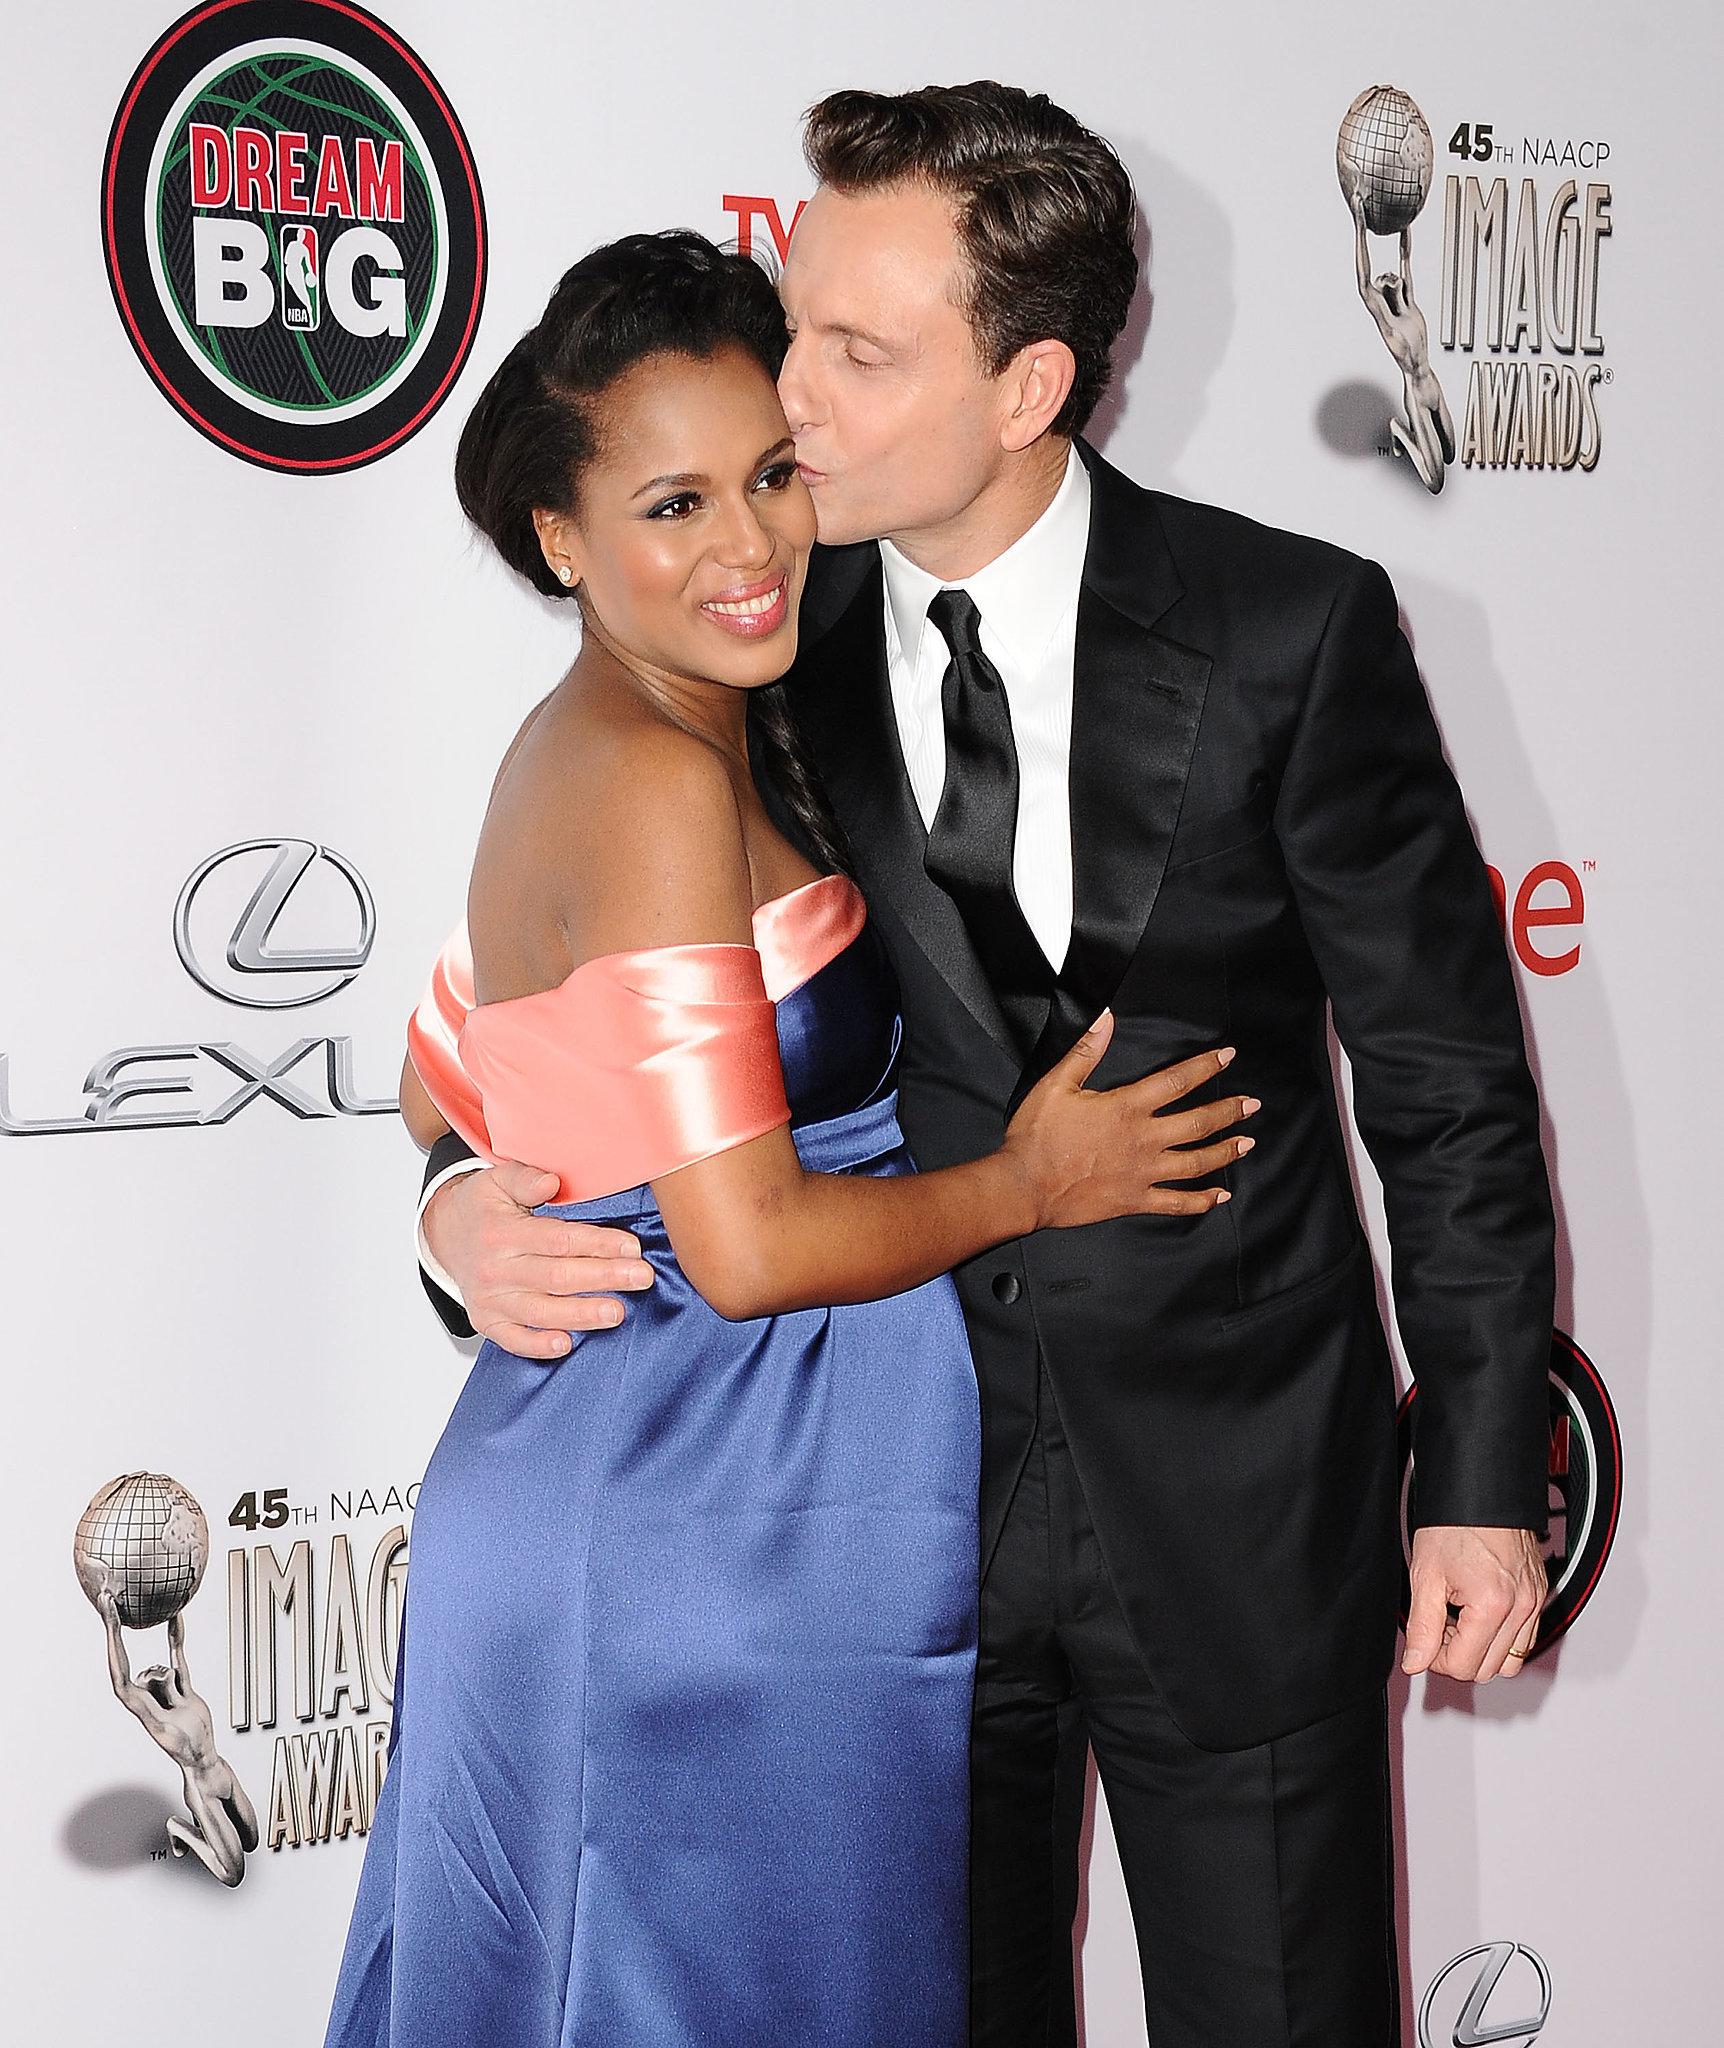 Scandal costars Kerry Washington and Tony Goldwyn got kissy for a photo at the NAACP Image Awards.